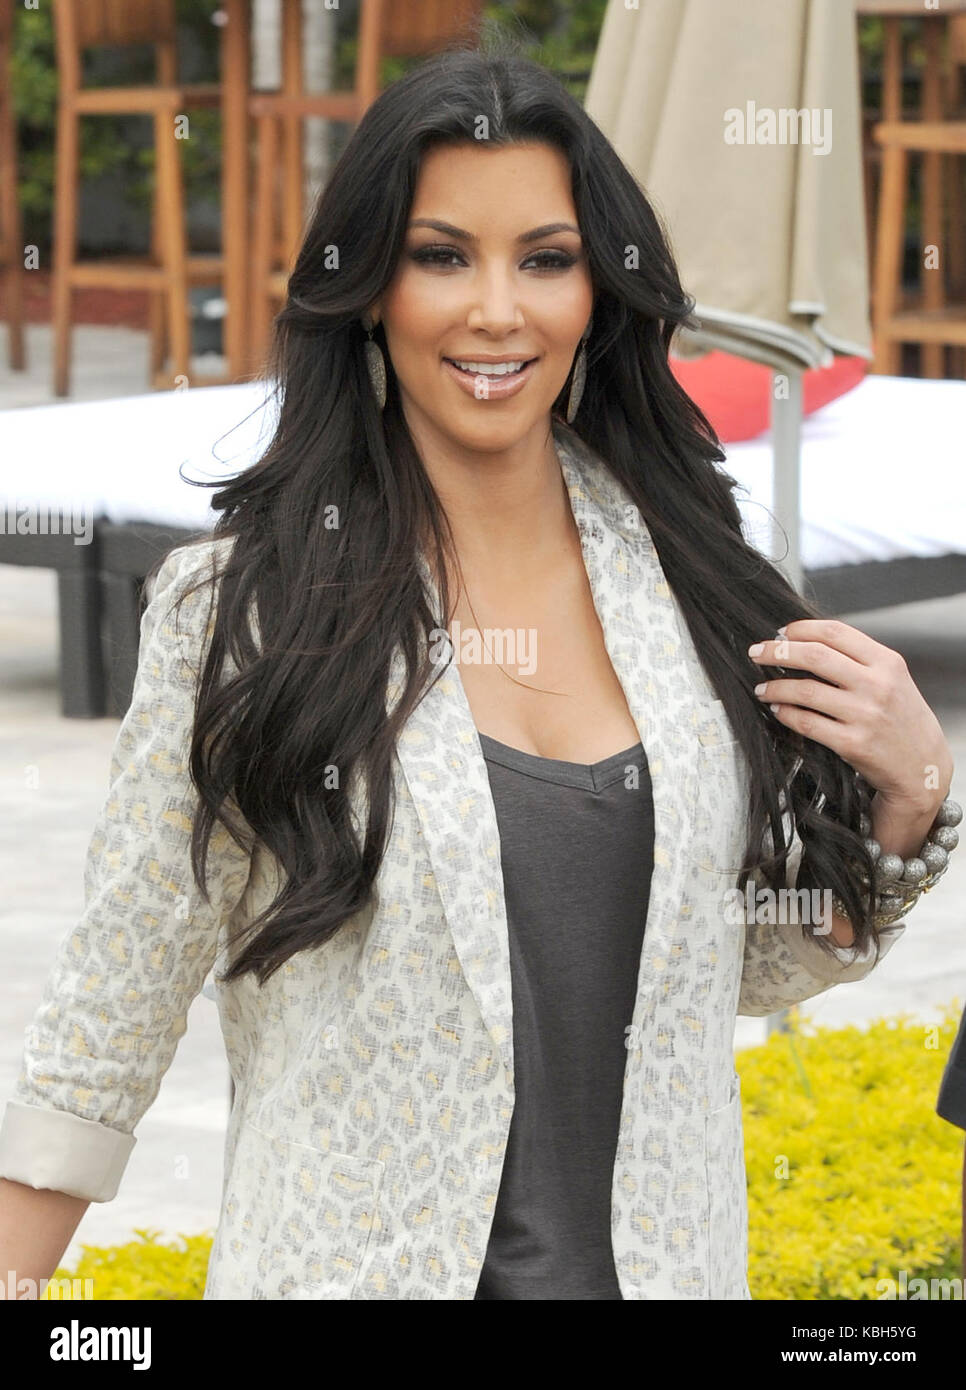 MIAMI BEACH, FL - MARCH 24: Kim Kardashian and Reggie Bush